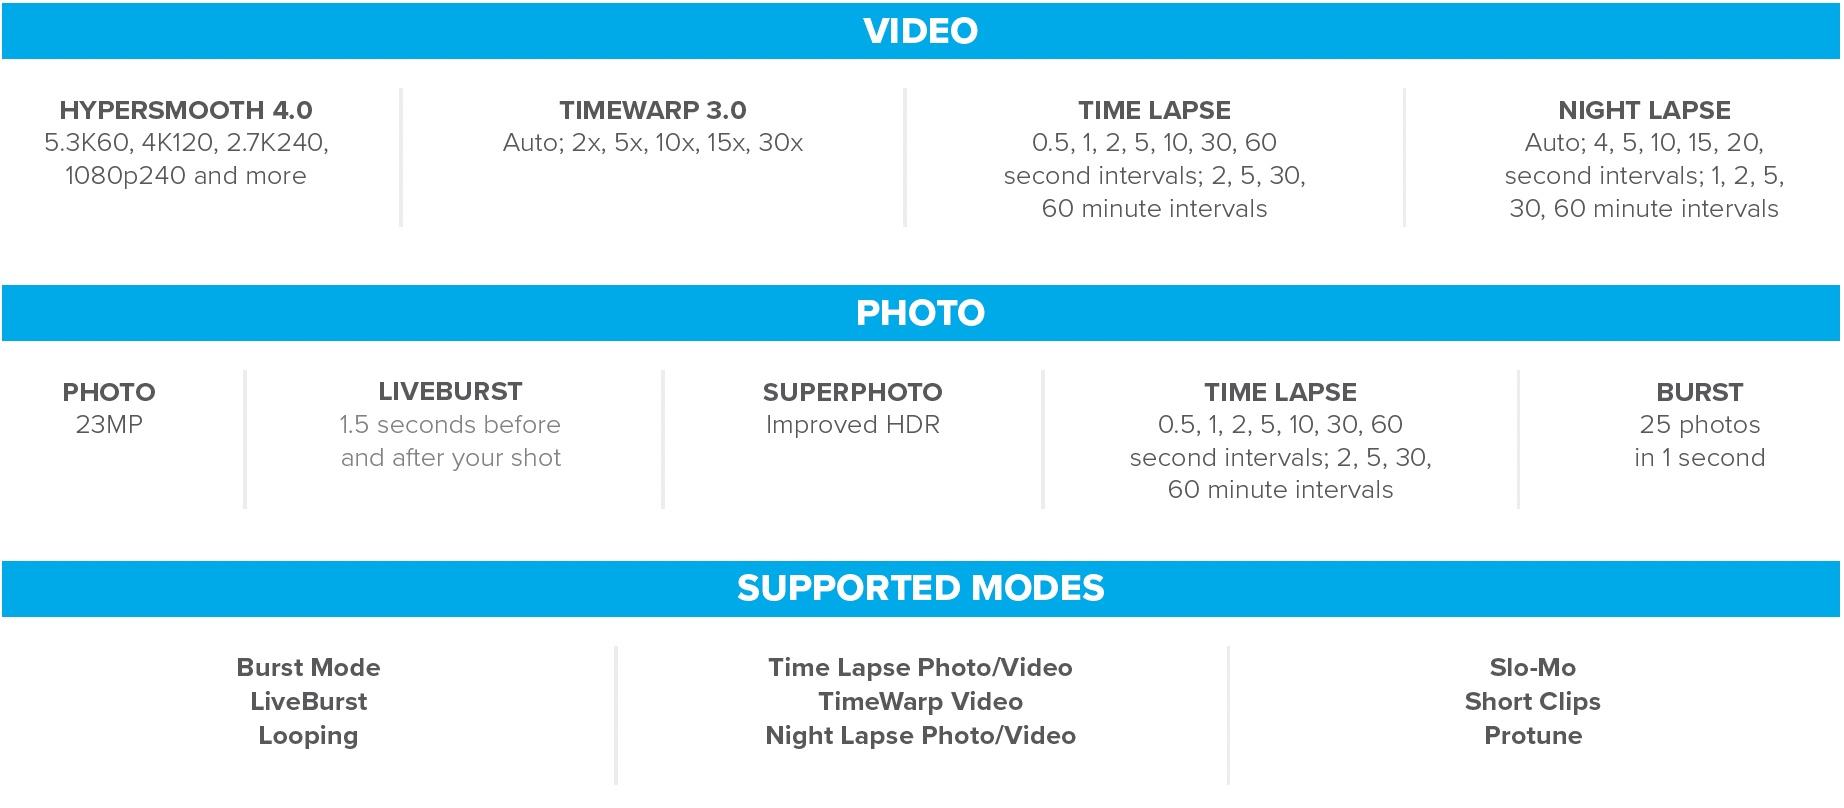 Video and Photo capabilities of the GoPro HERO10 Black